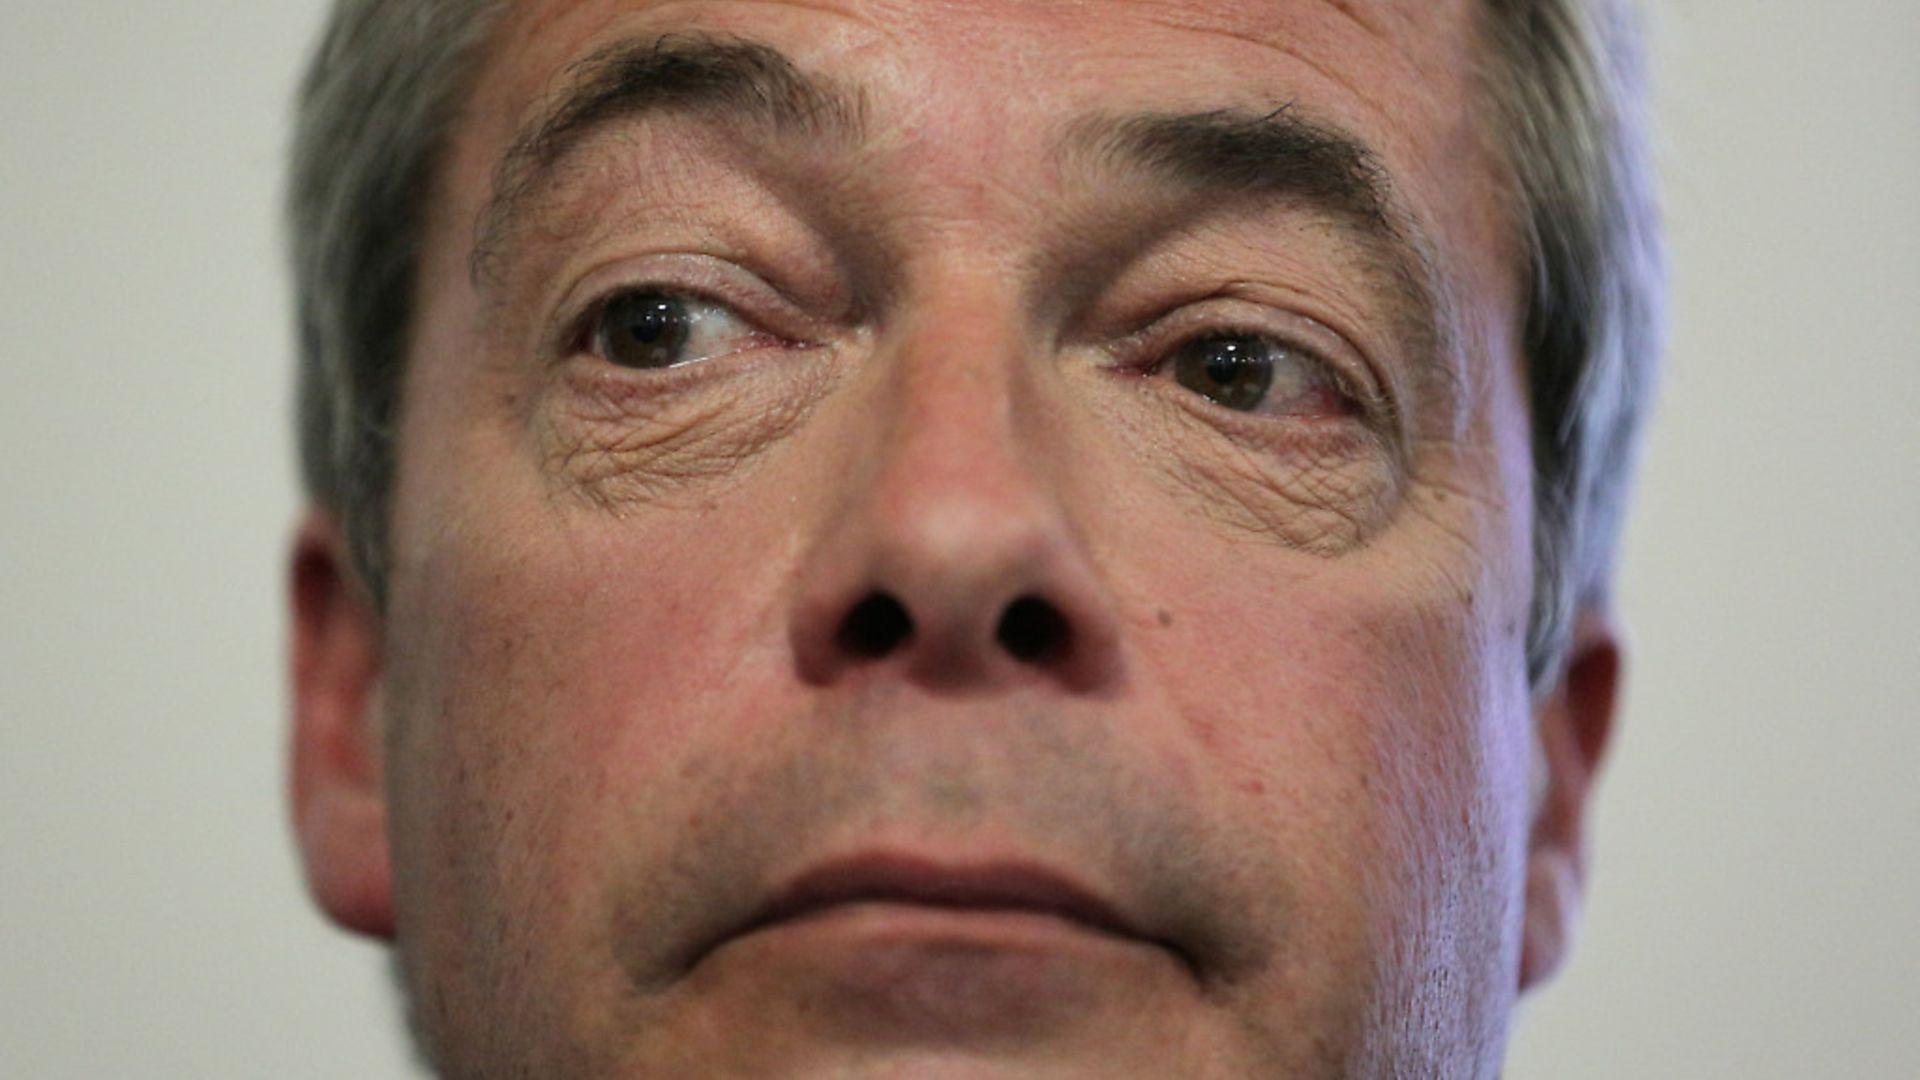 Nigel Farage. Photograph: Daniel Leal-Olivas/PA Images. - Credit: PA Wire/PA Images